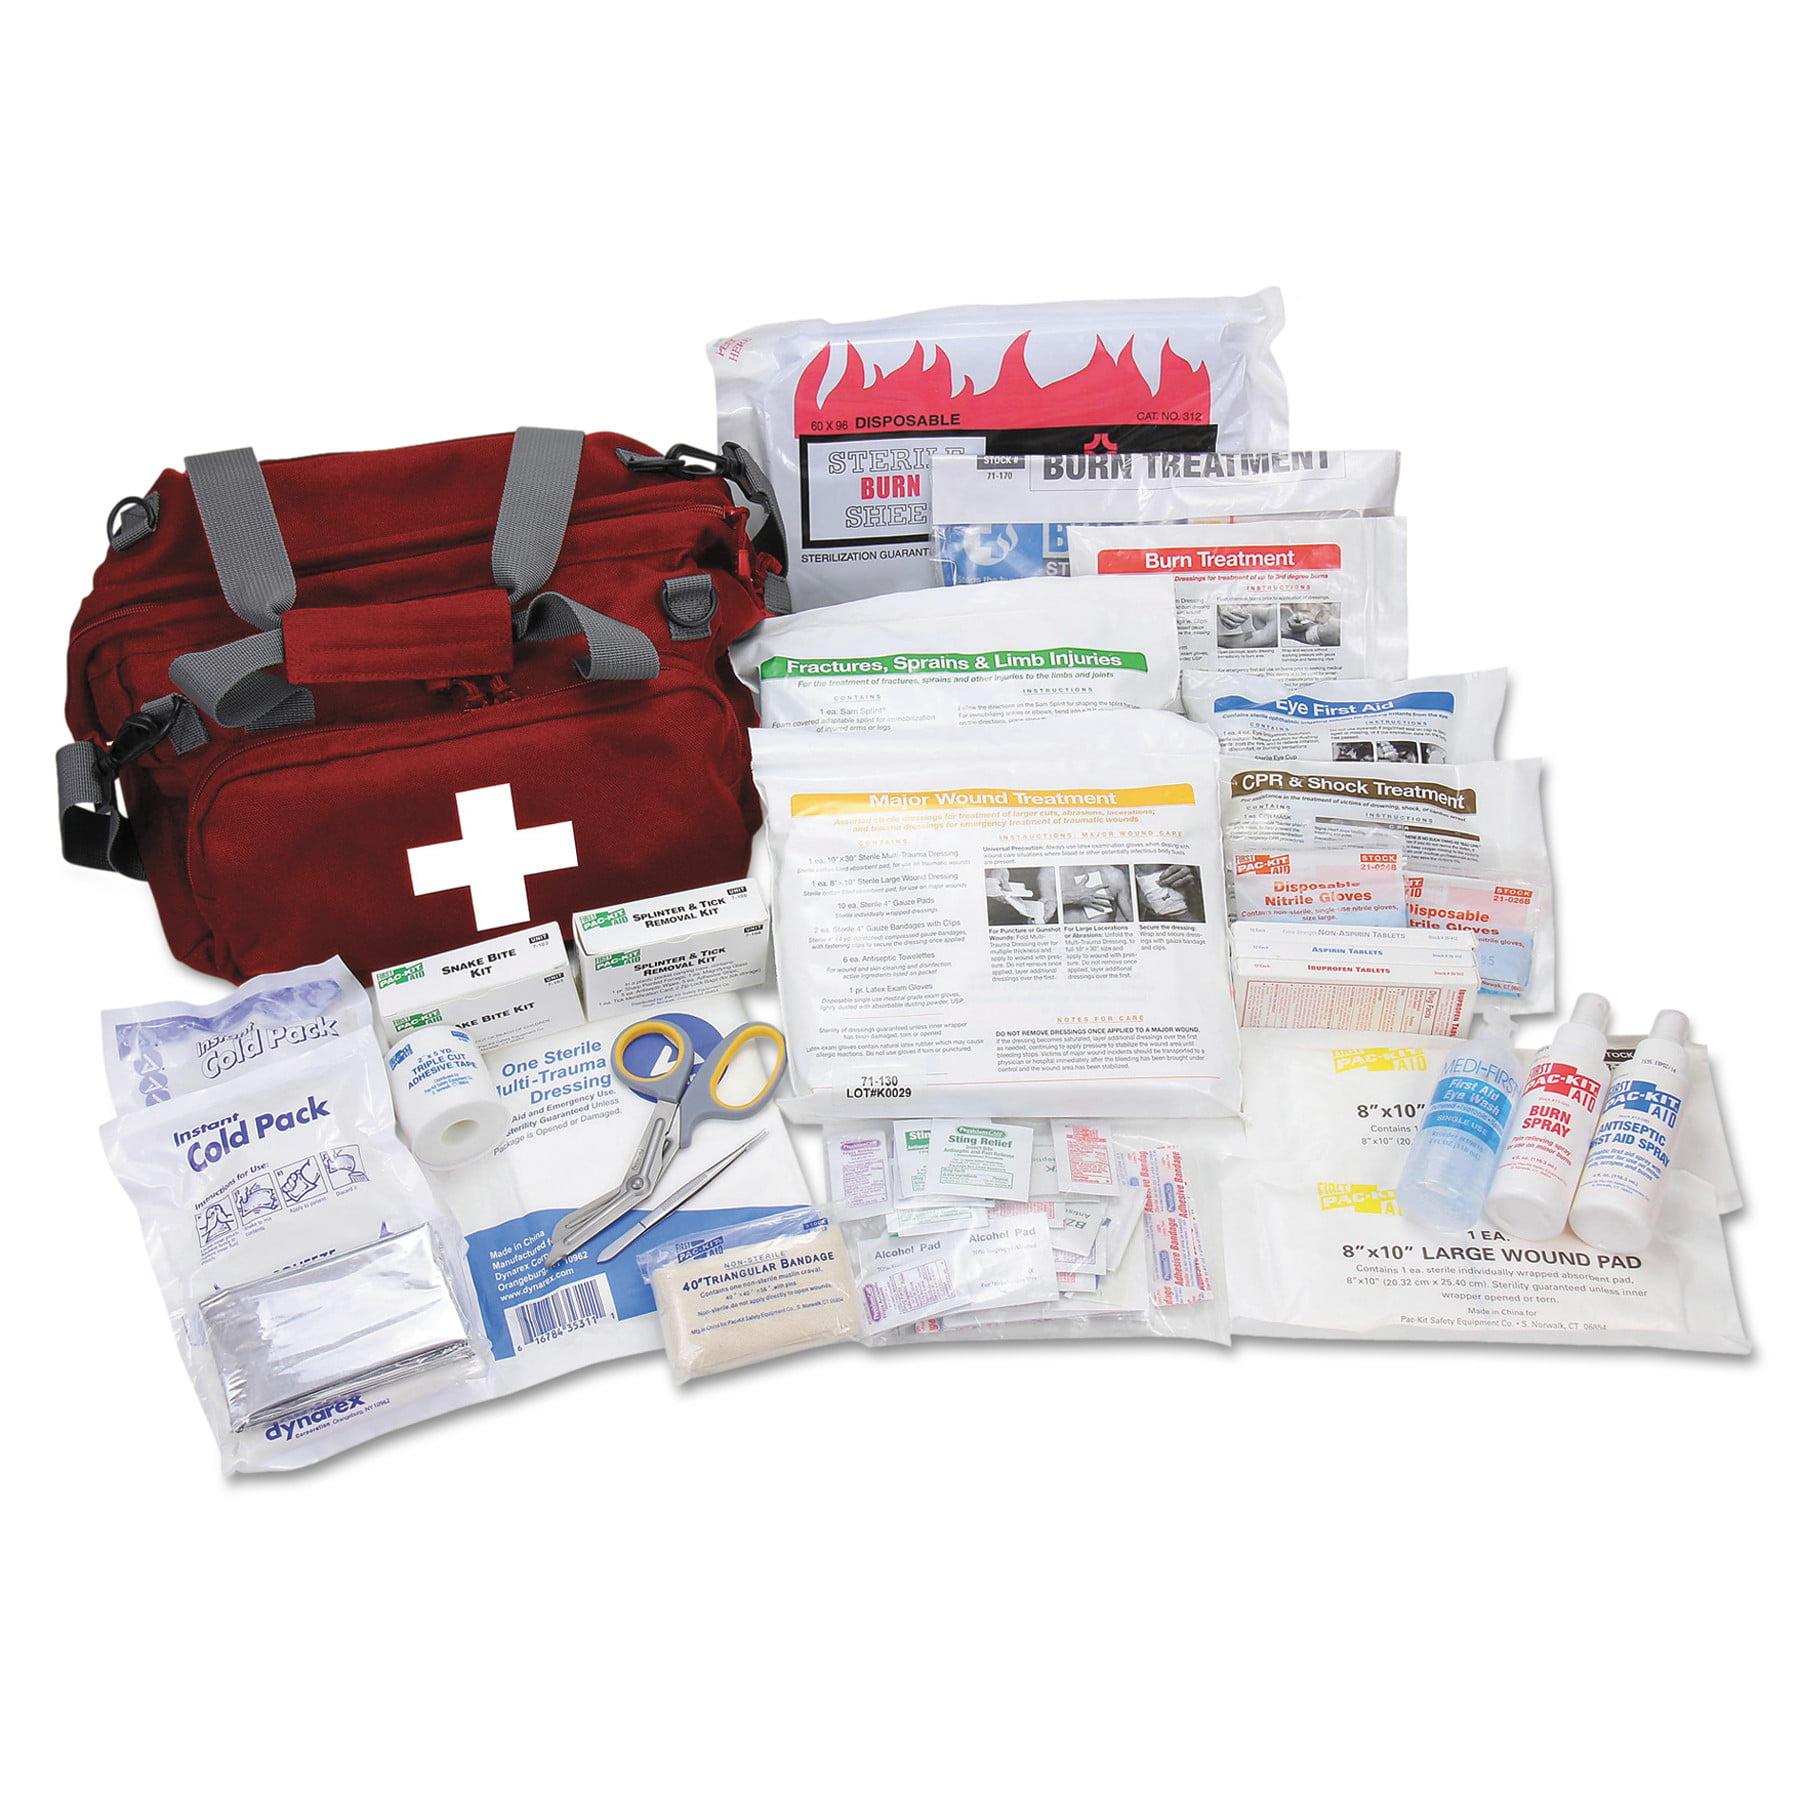 Pac-Kit All Terrain First Aid Kit, 112 Pieces, Ballistic Nylon, Red